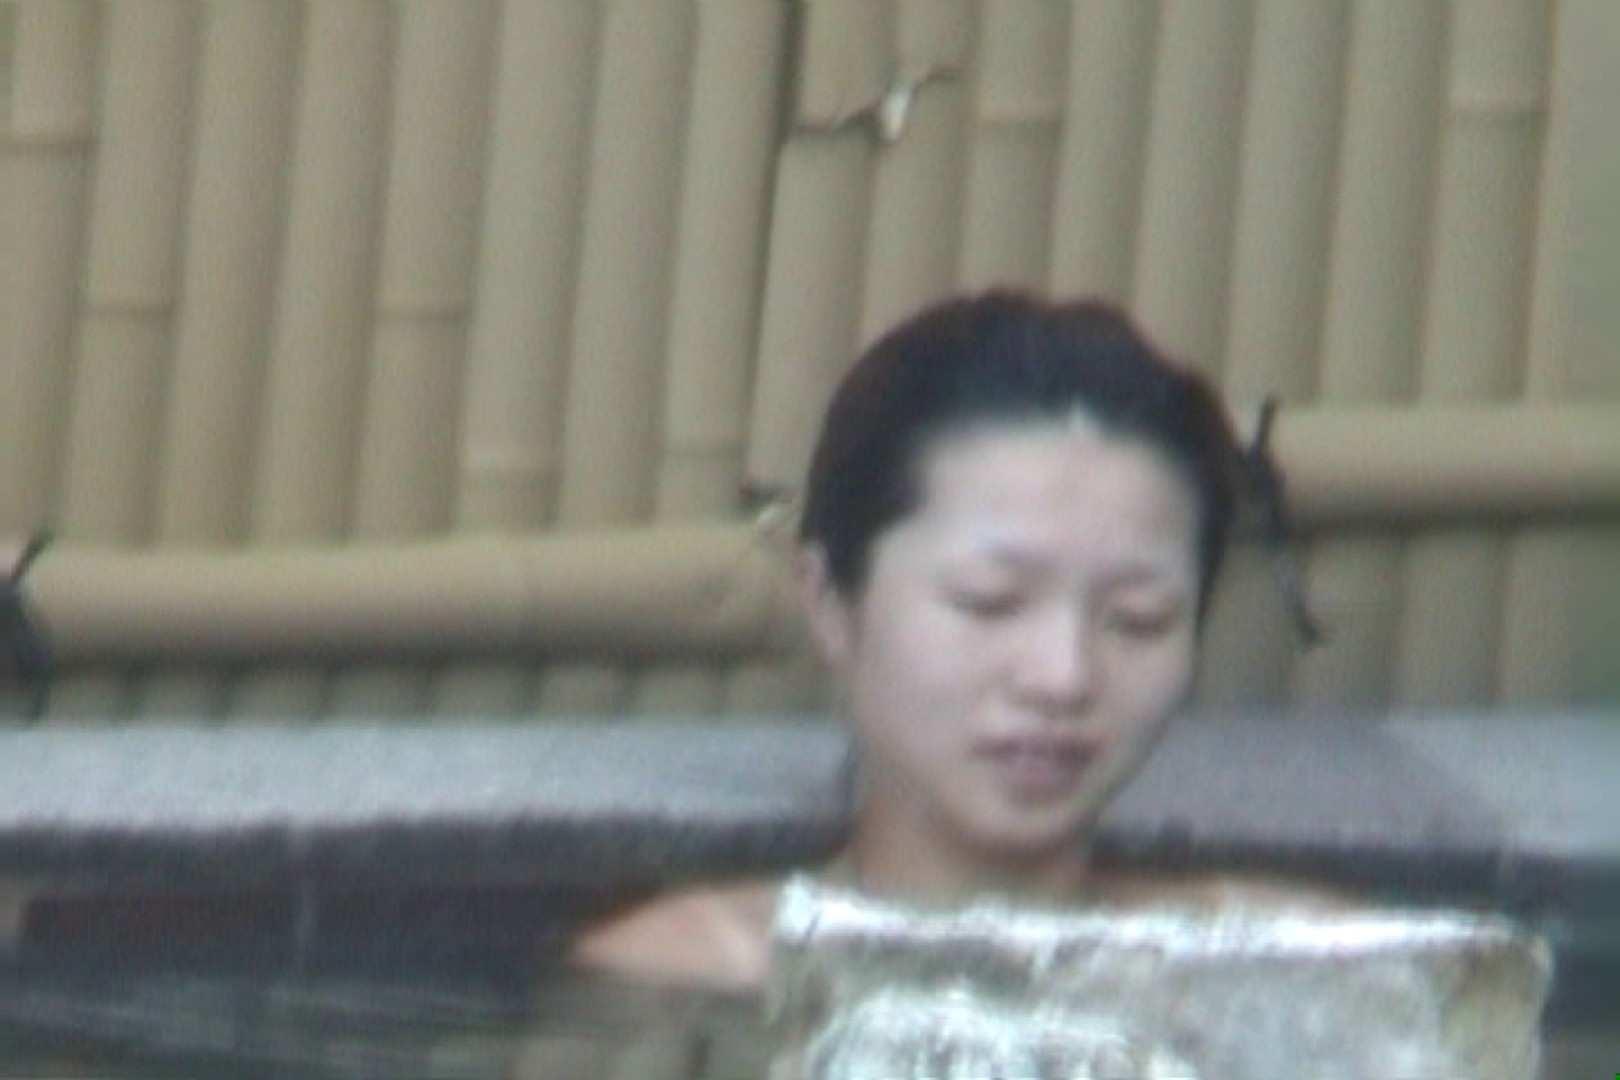 Aquaな露天風呂Vol.571 盗撮 | OLセックス  83画像 4